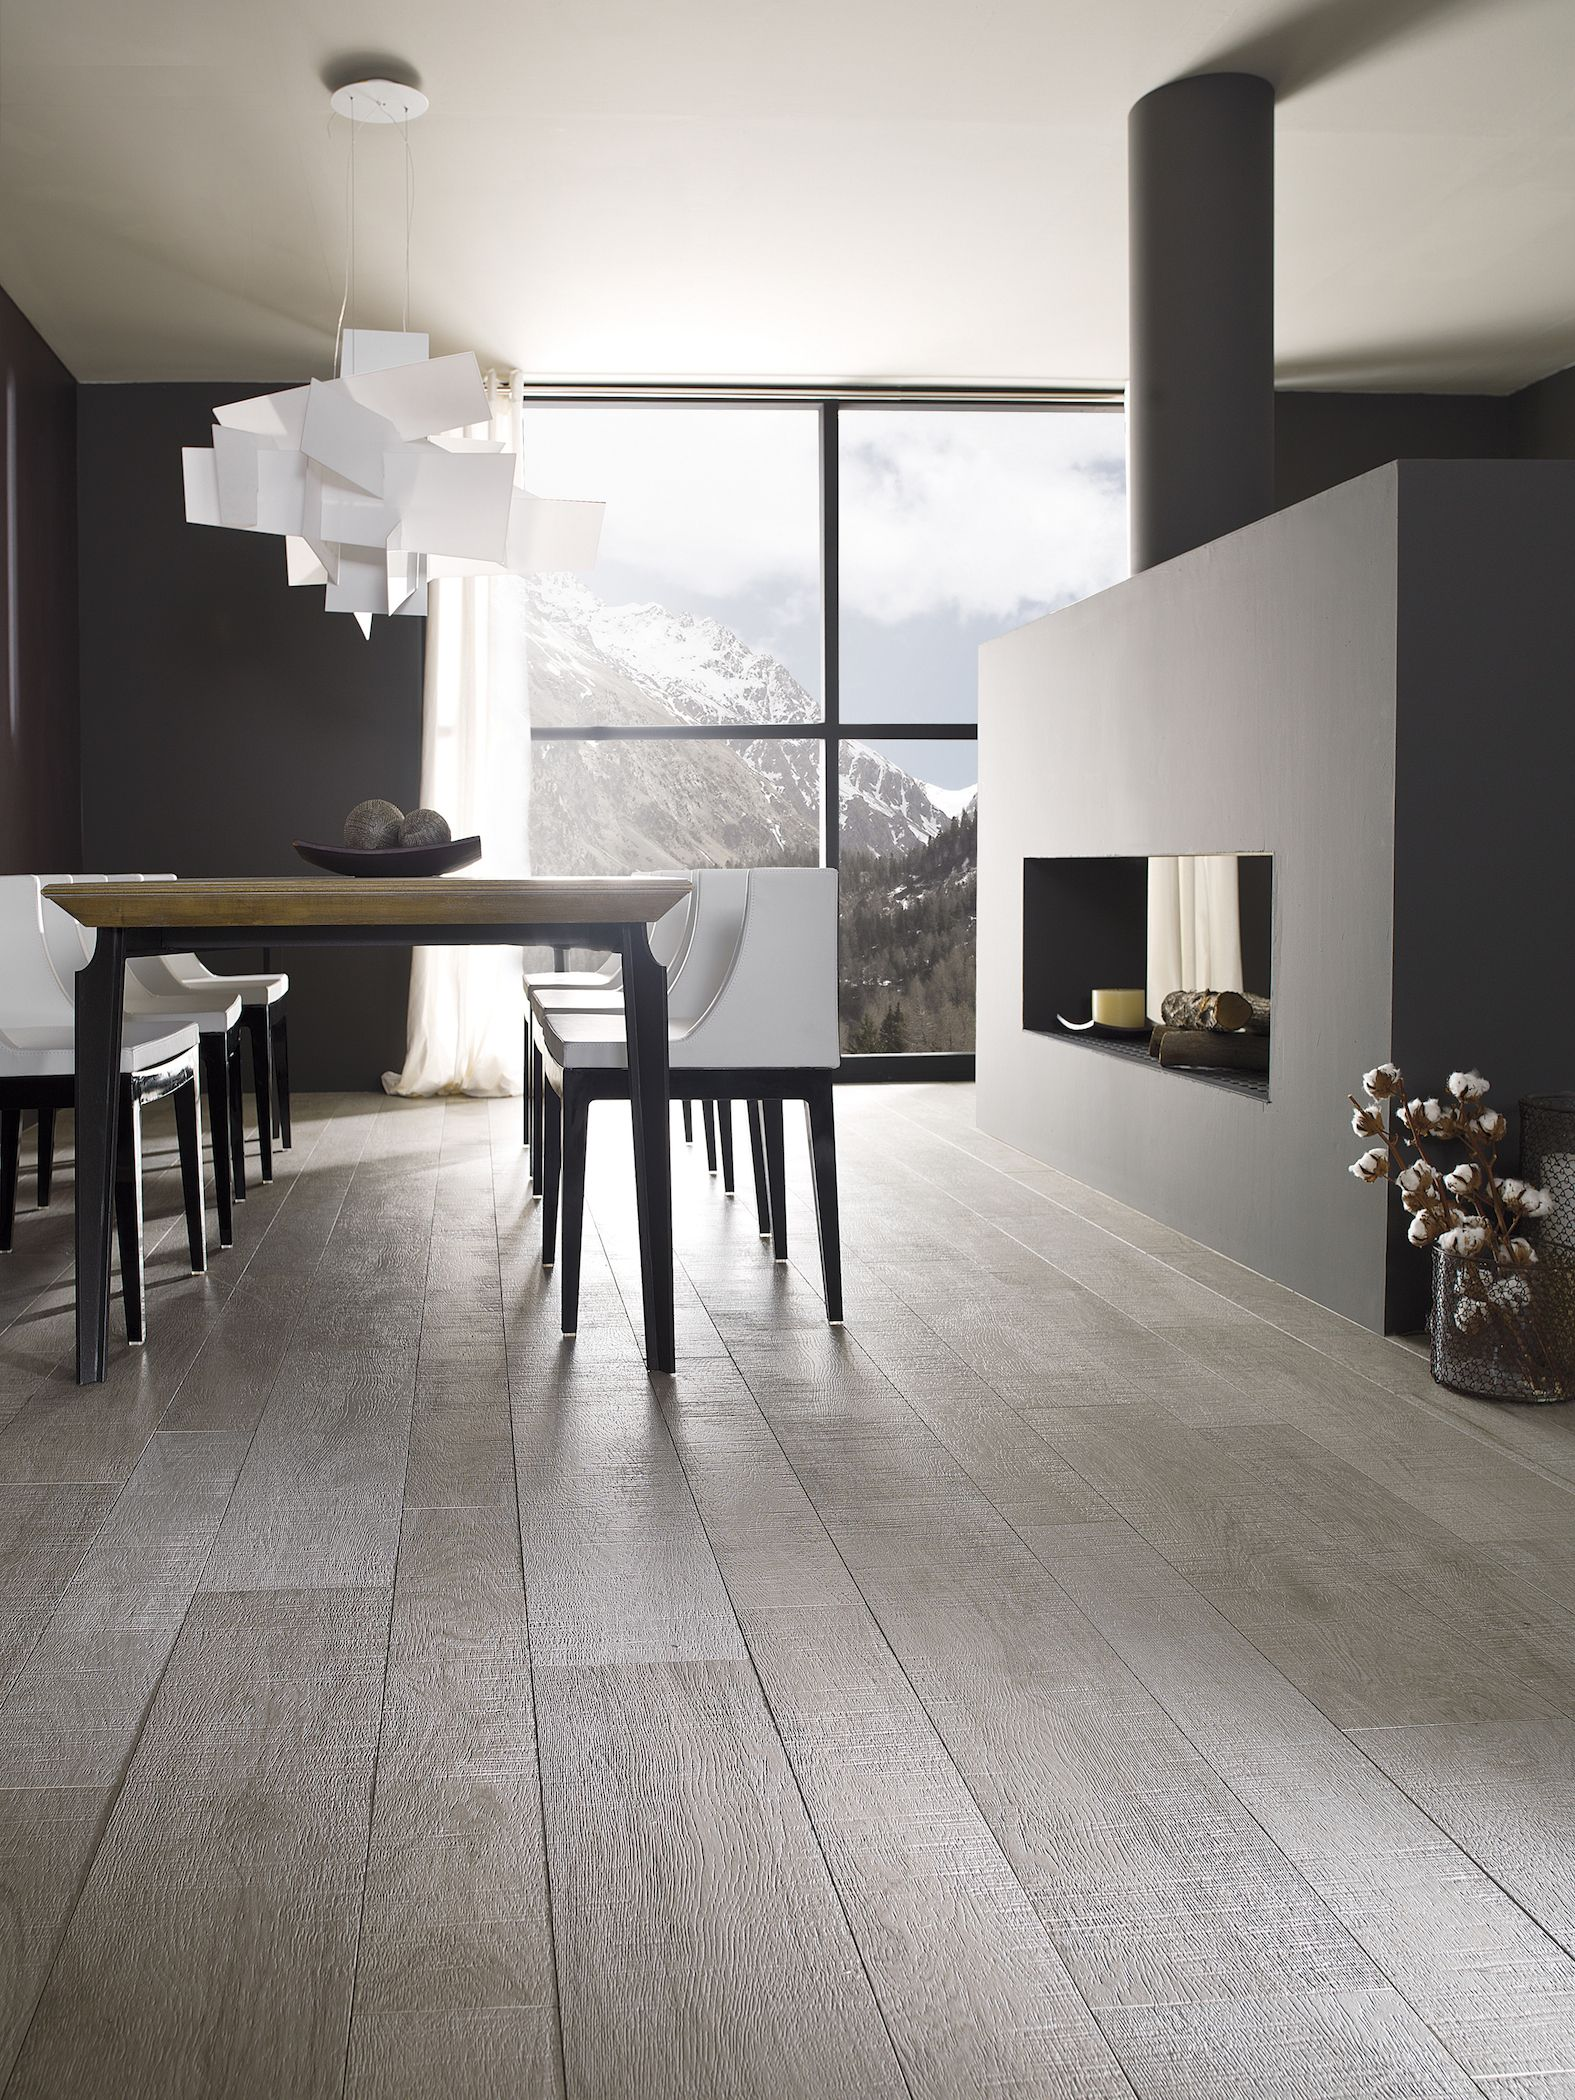 Porcelanosa Oxford Acero Home Wooden Floor Tiles Living Room Tiles